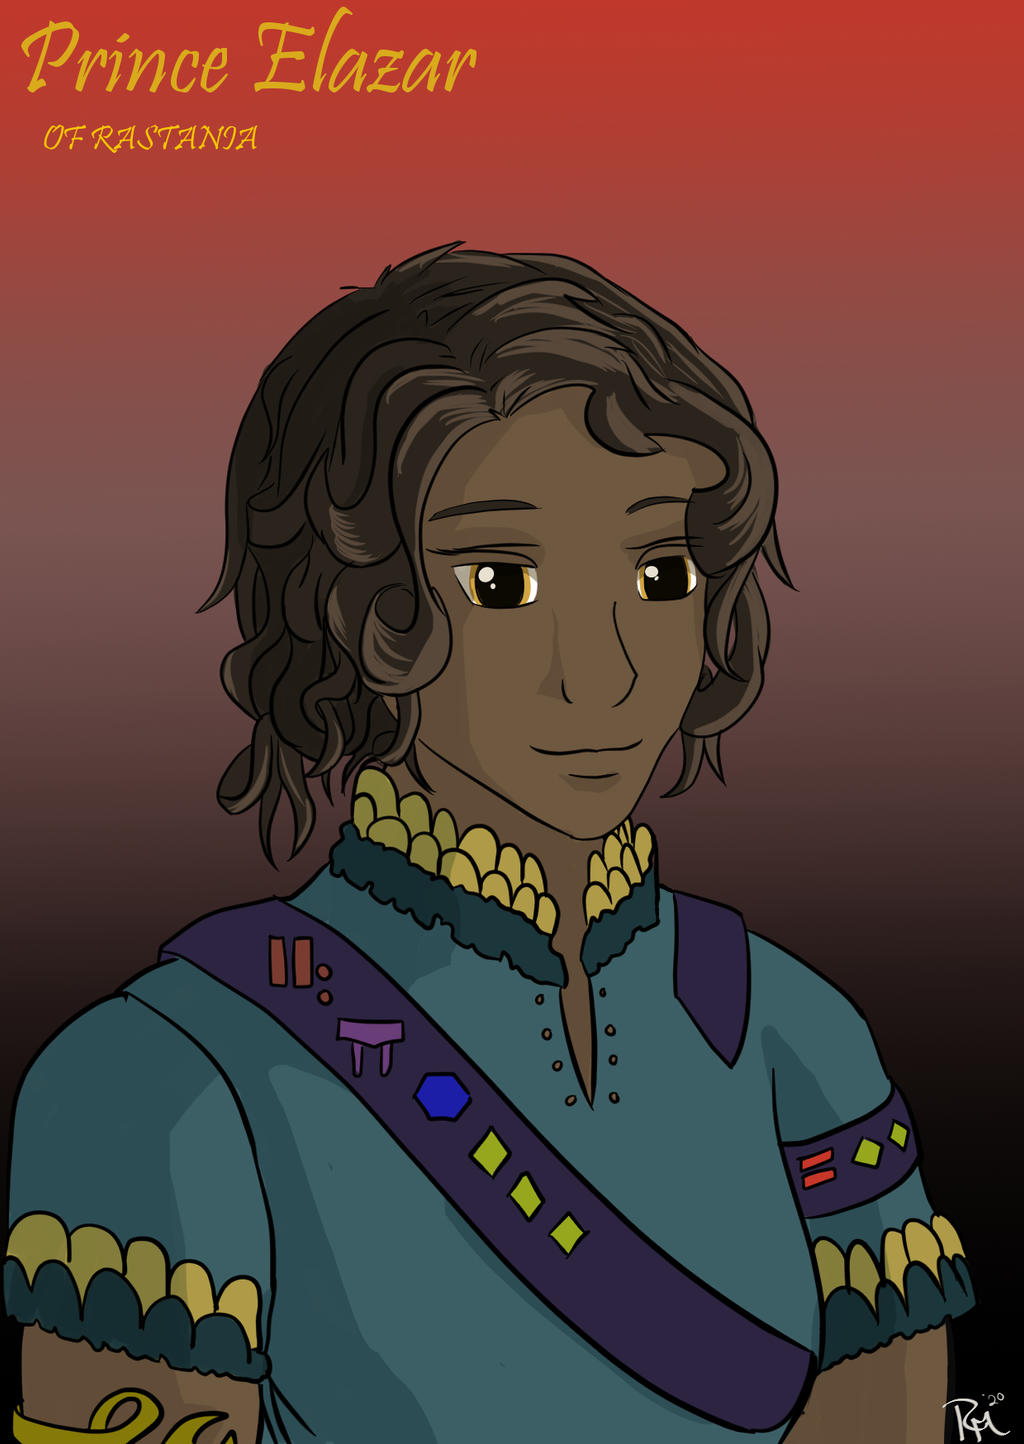 prince_elazar_of_rastania_by_lilwolfe006